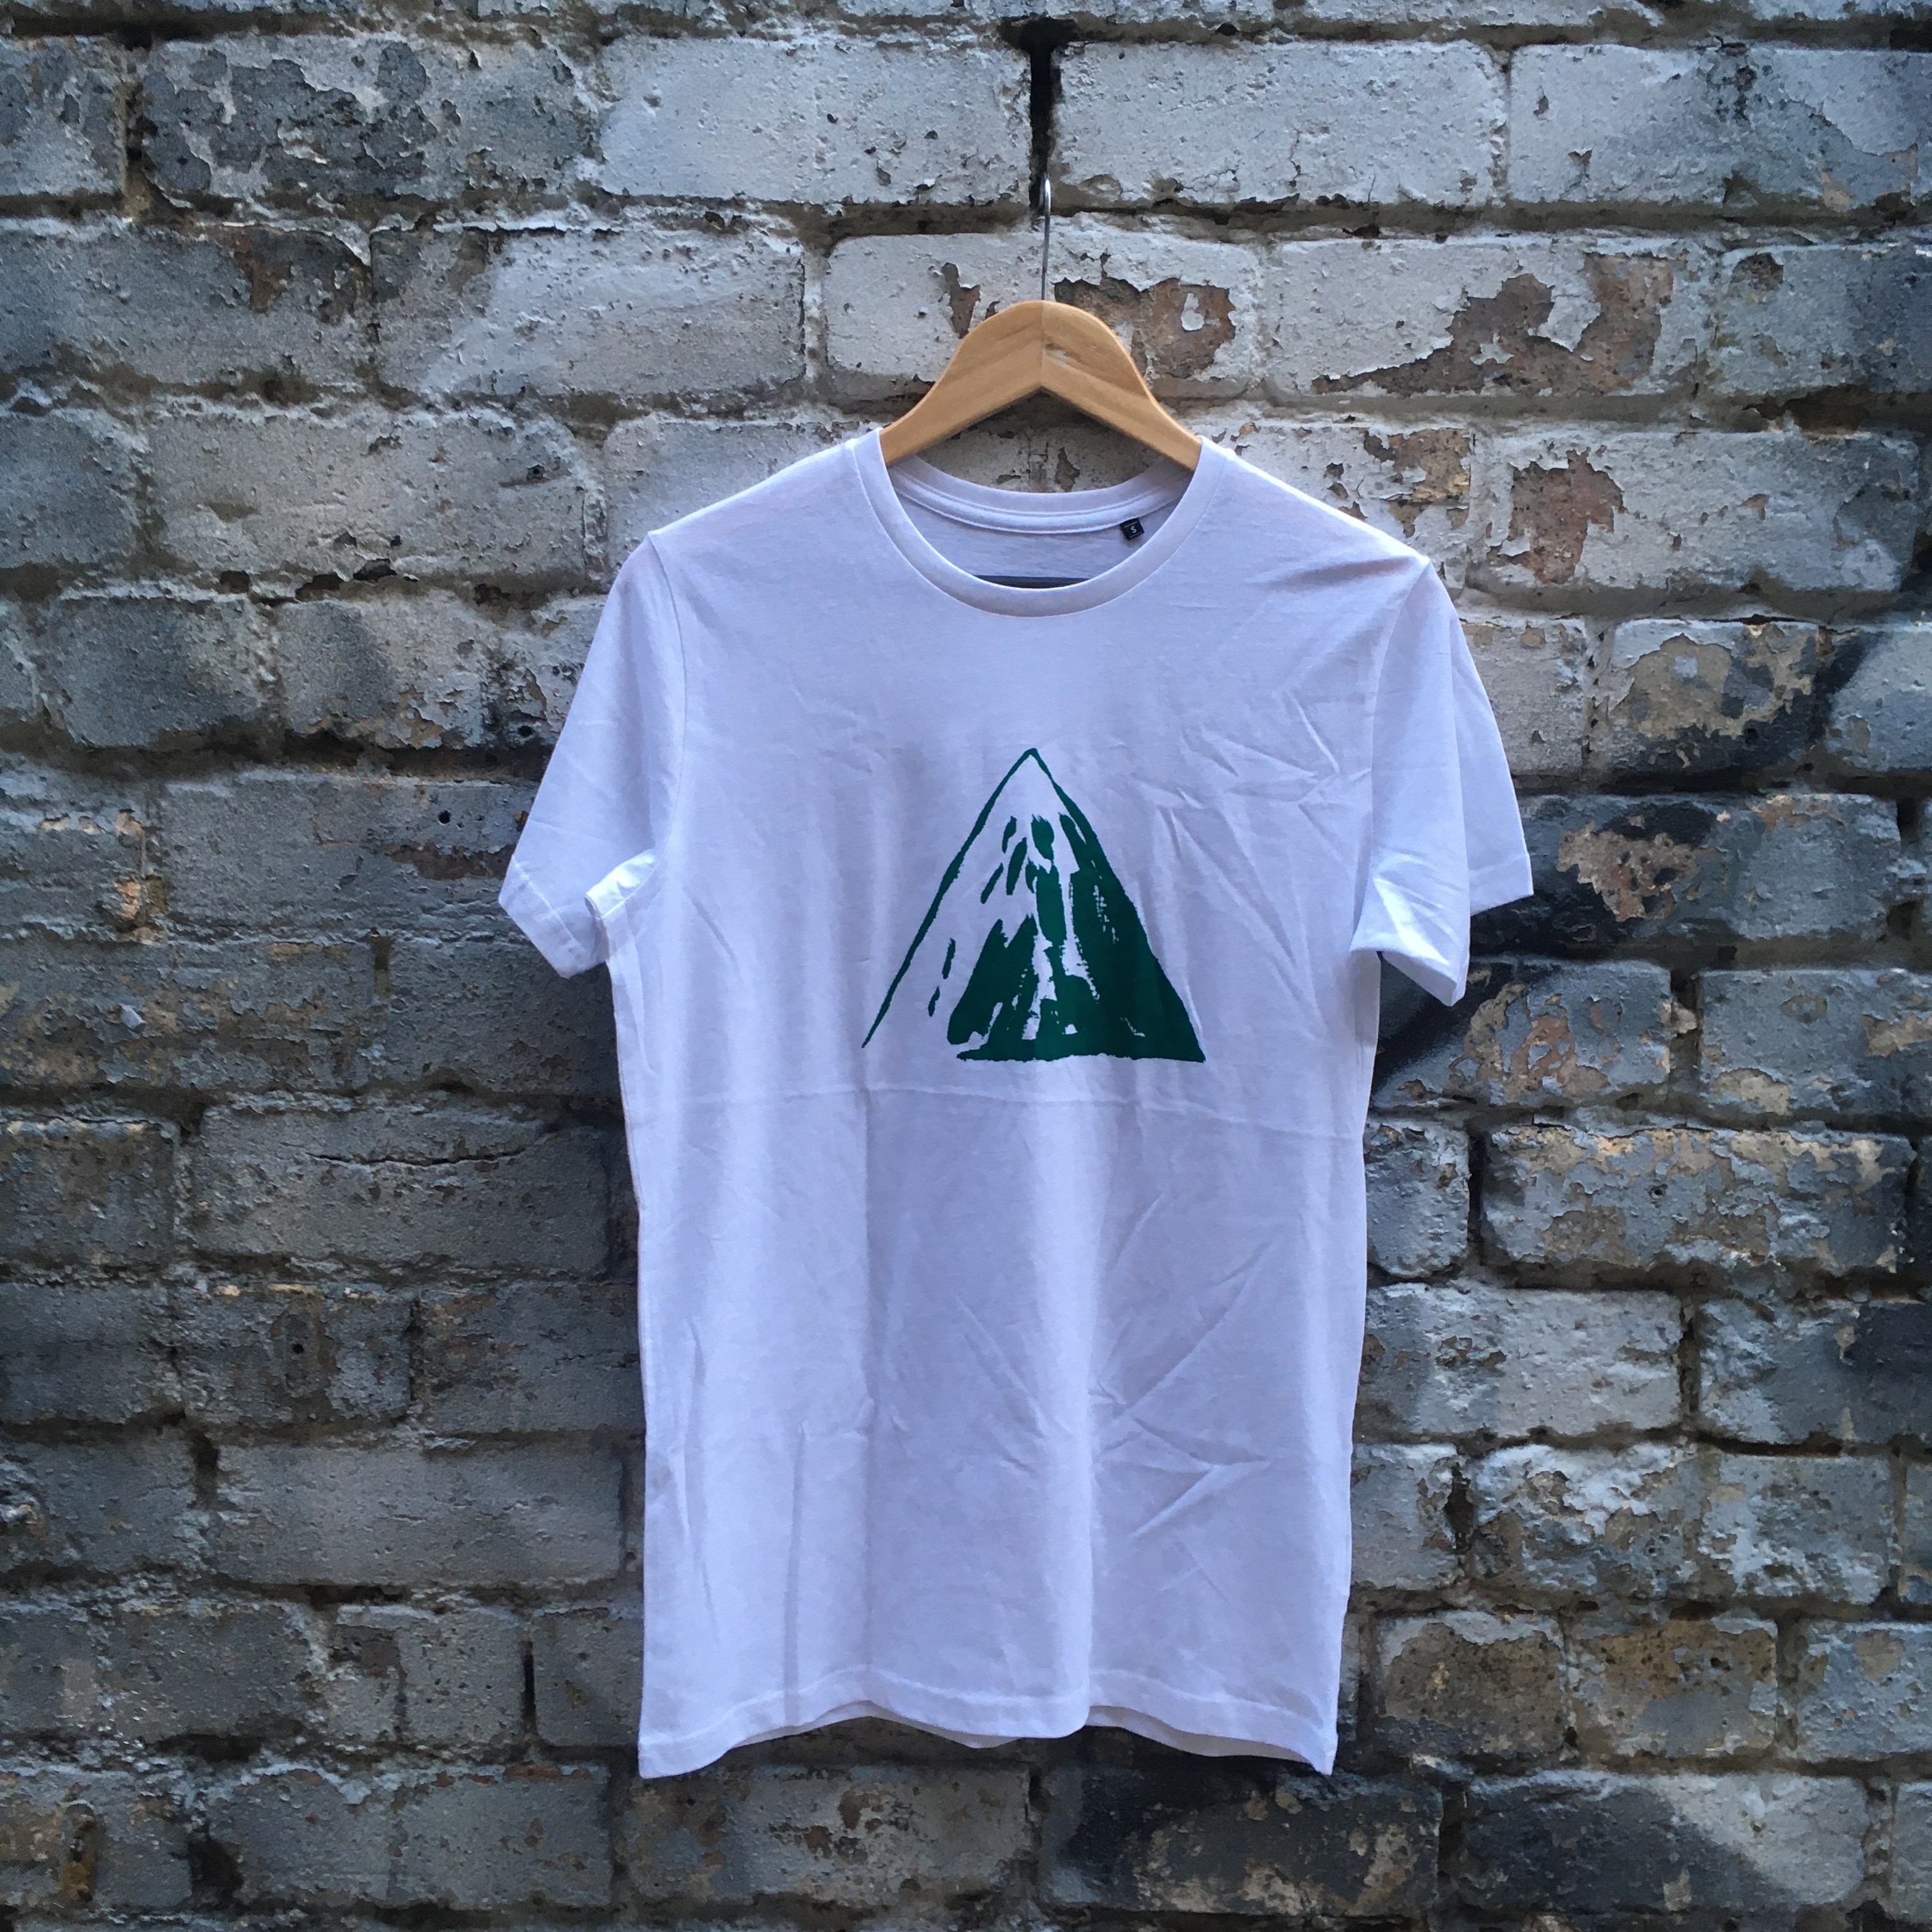 Mountain T-shirt- Bethany Thompson